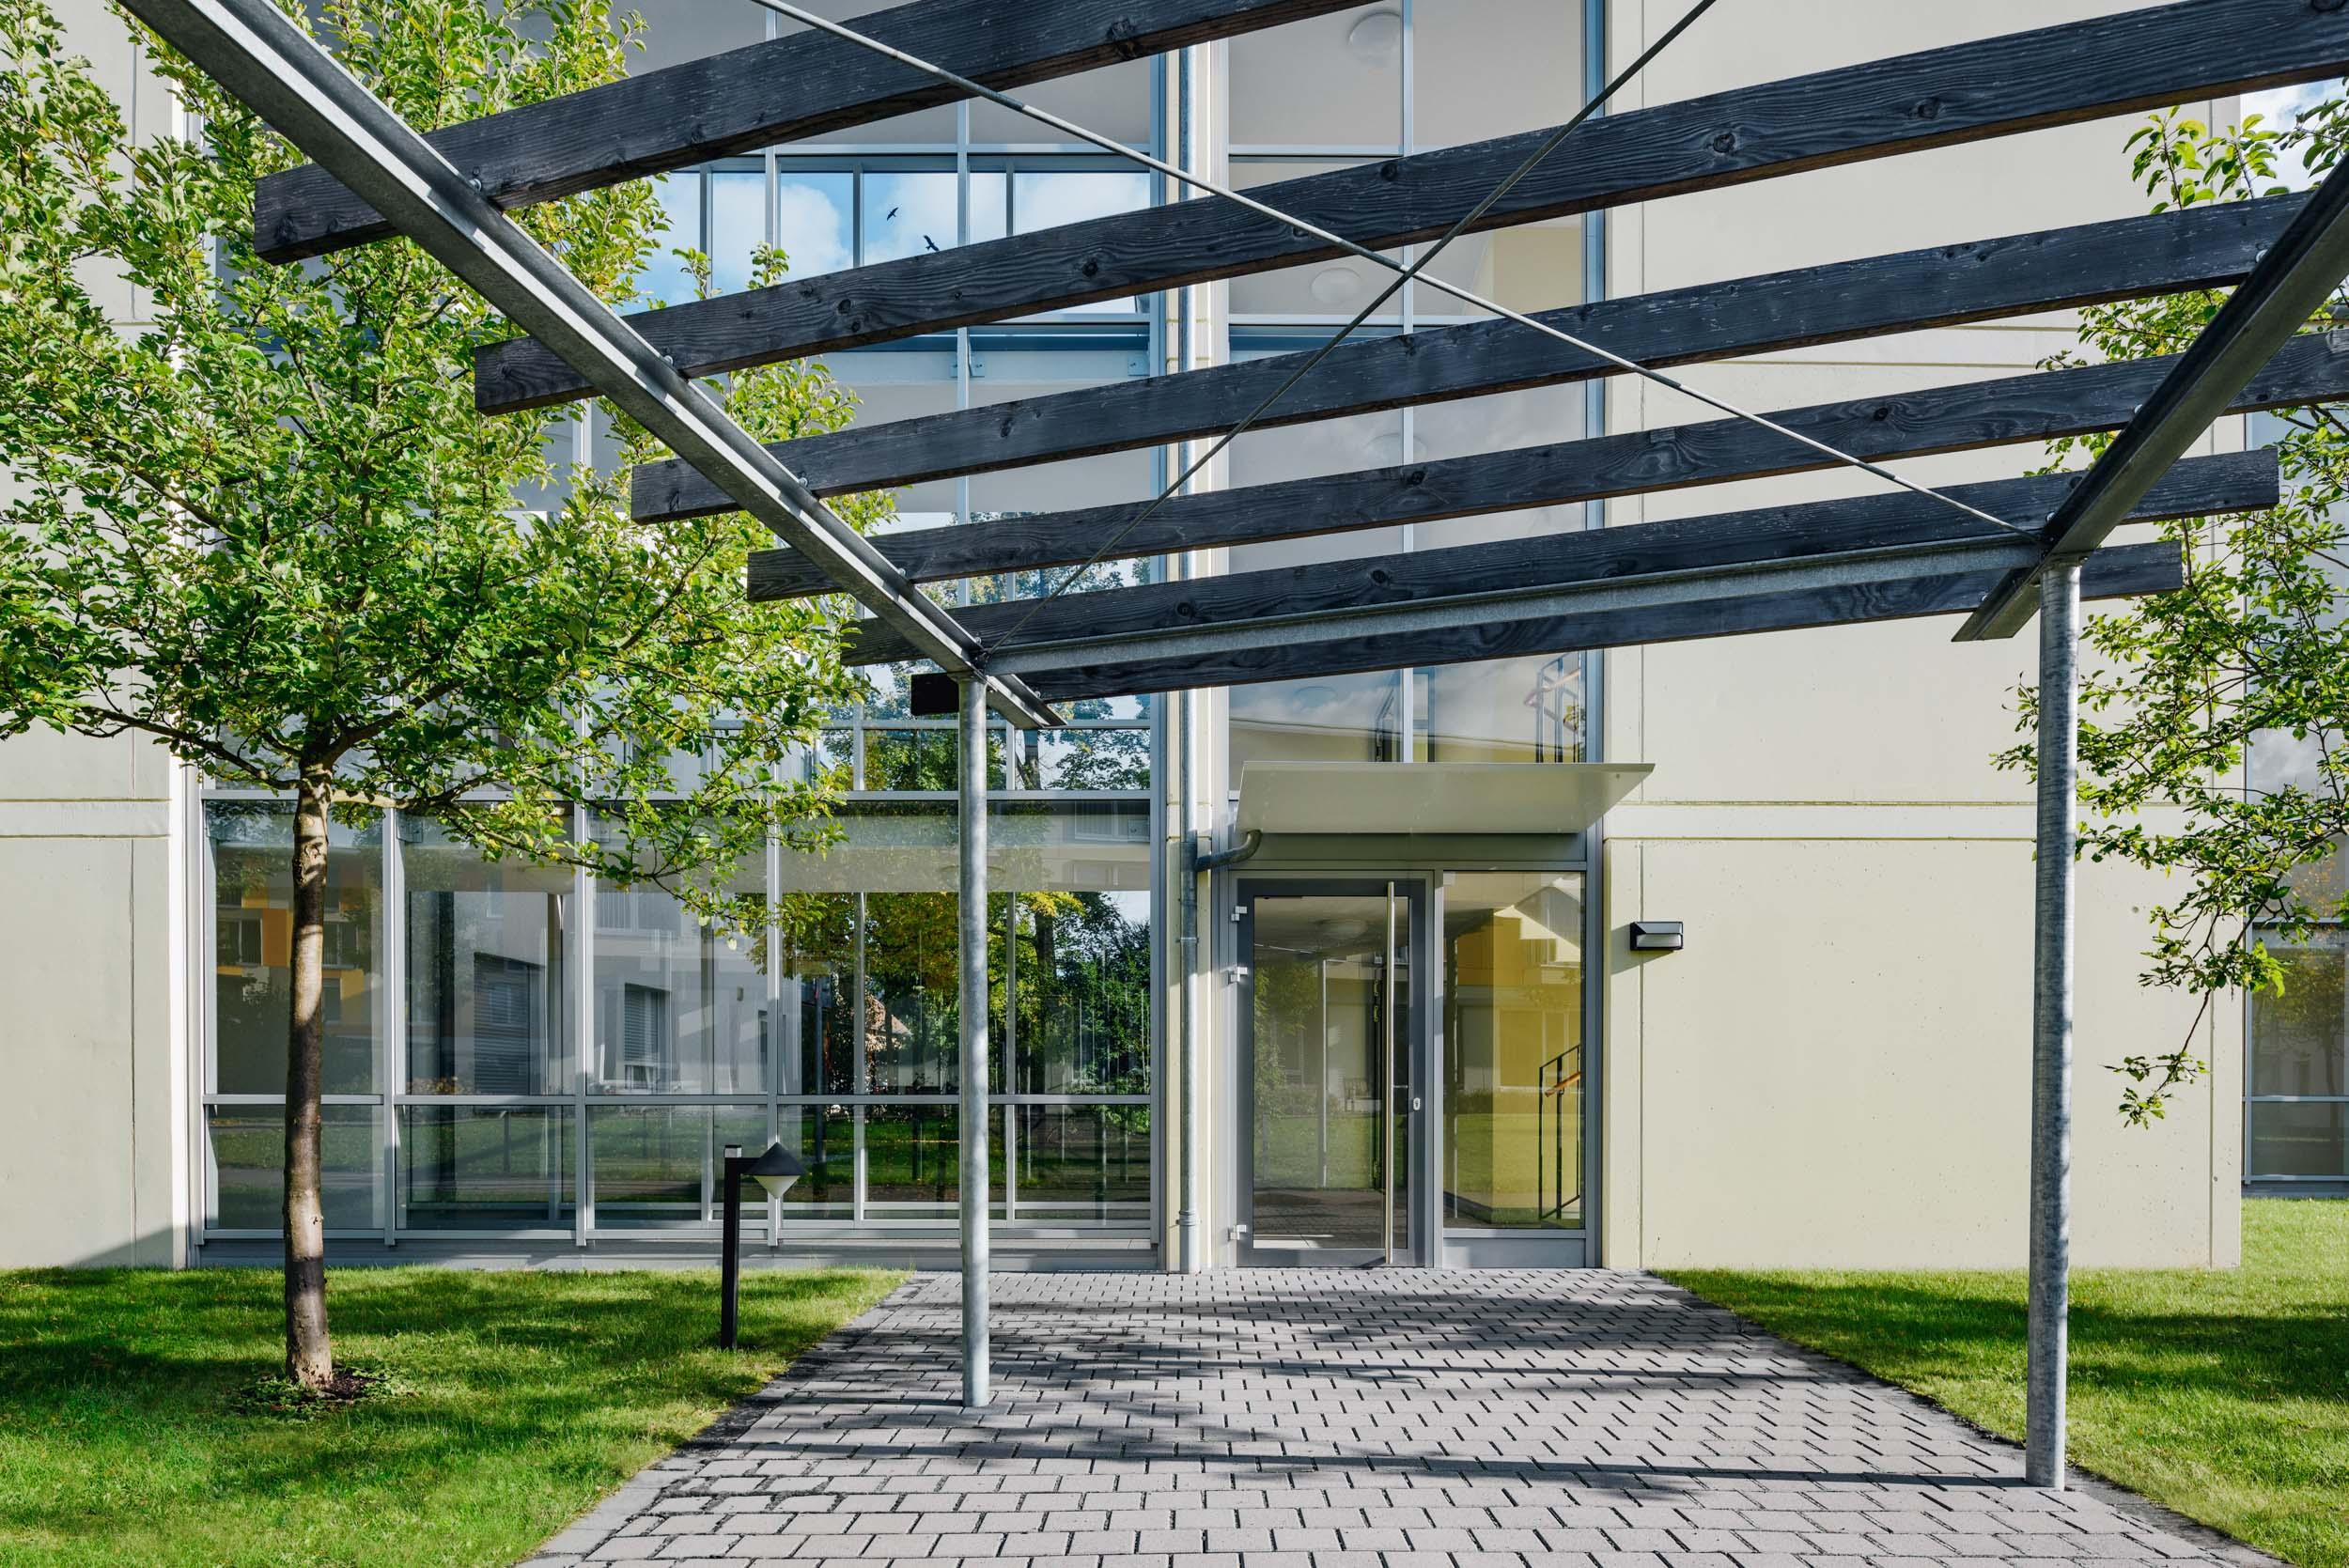 Gustav-Epple-Bauunternehmung-Gesundheit-Pflege-Waldau-StuttgartWaldau_MLX7799#00